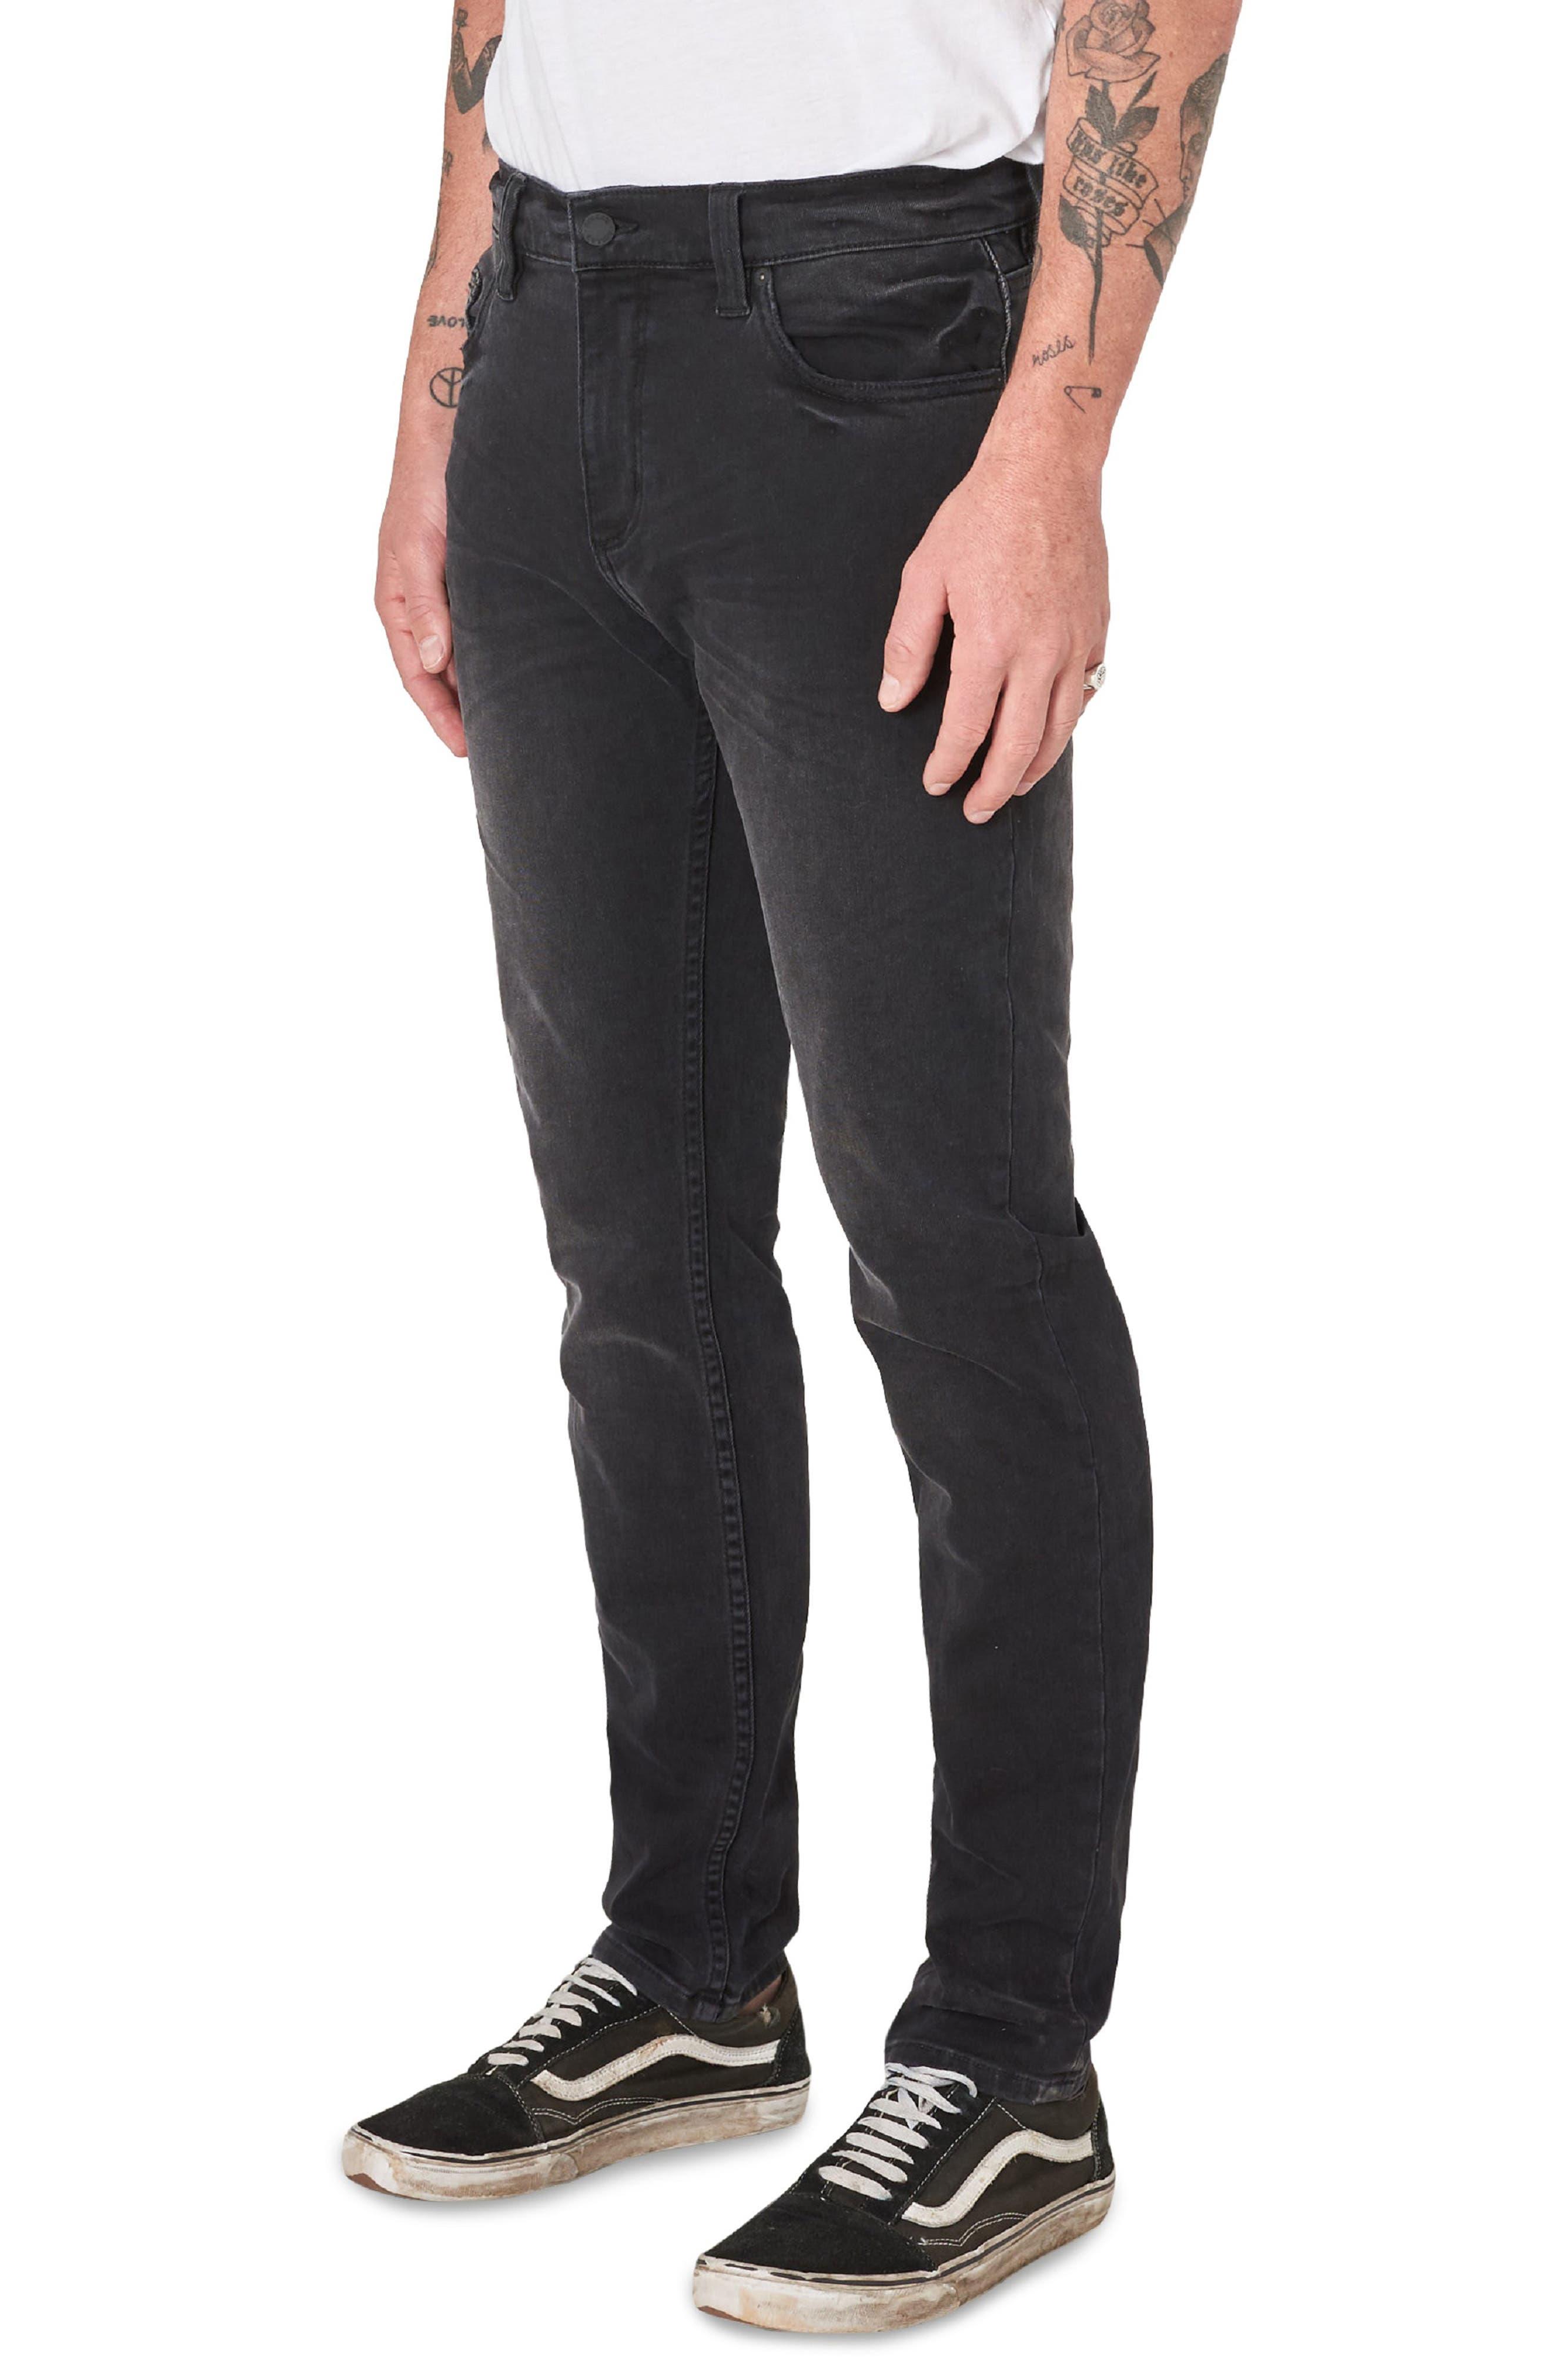 Stinger Skinny Fit Jeans,                             Alternate thumbnail 3, color,                             BLACK CAT